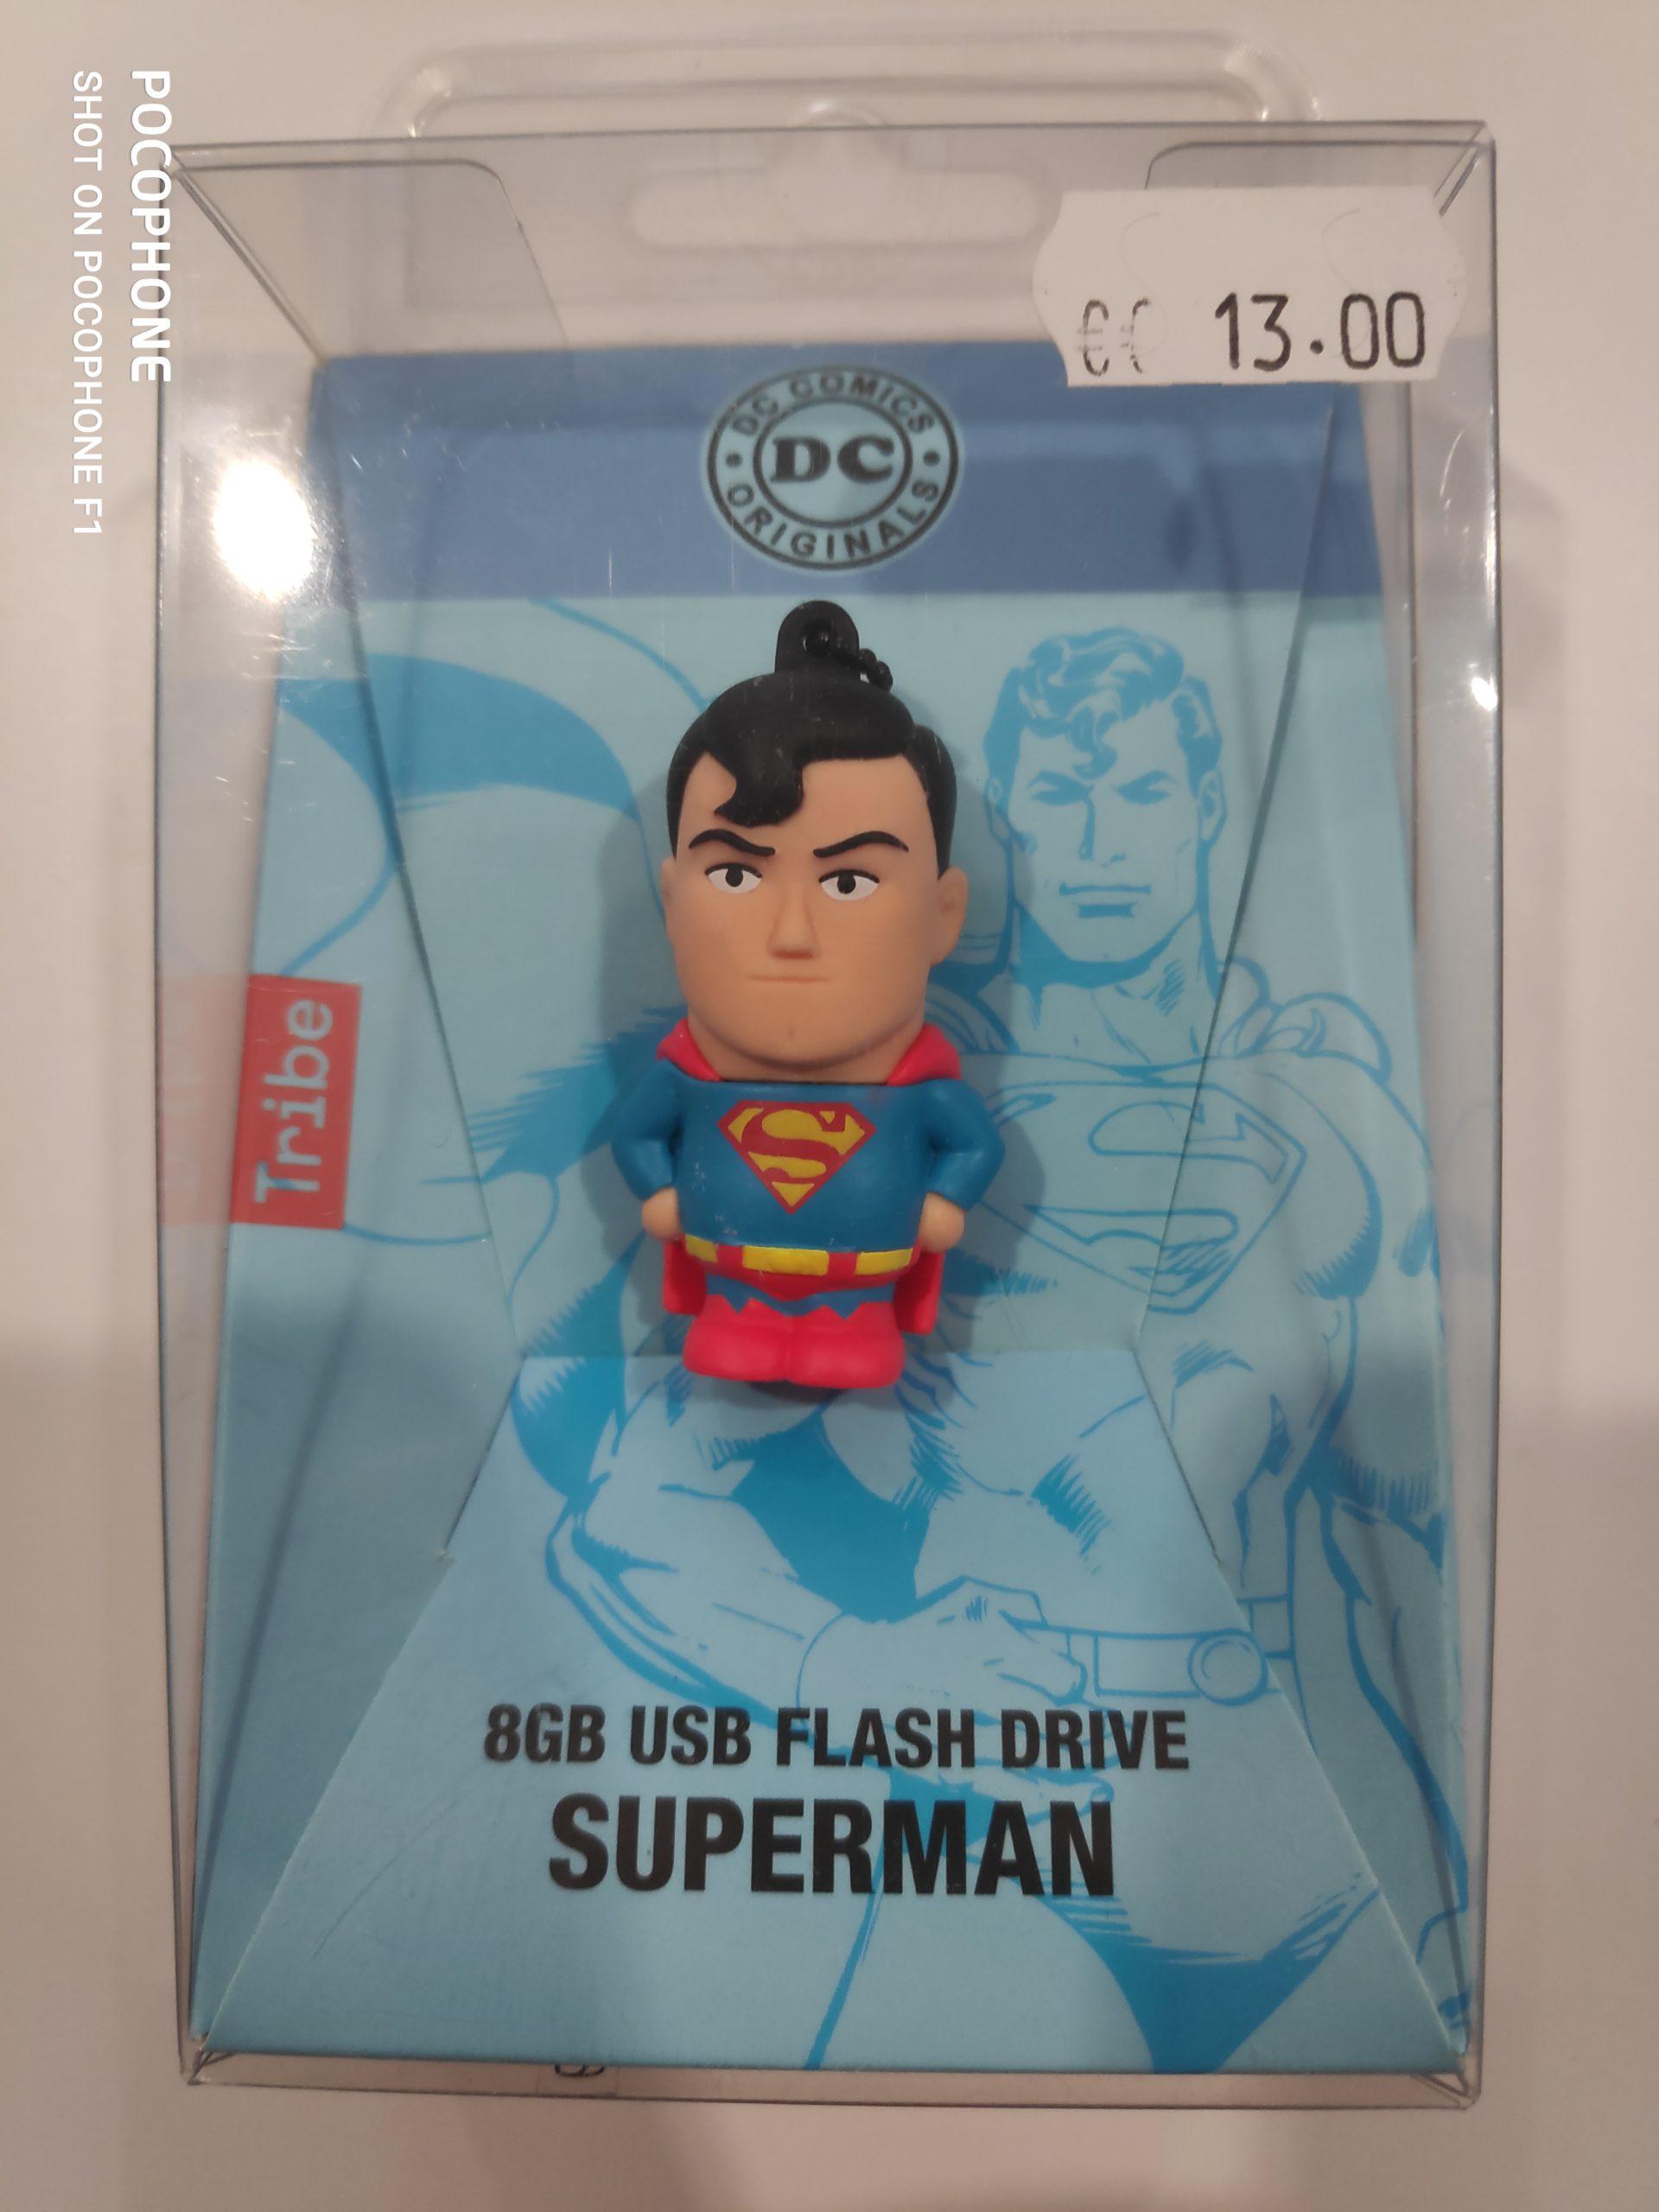 Clé USB 8GB superman